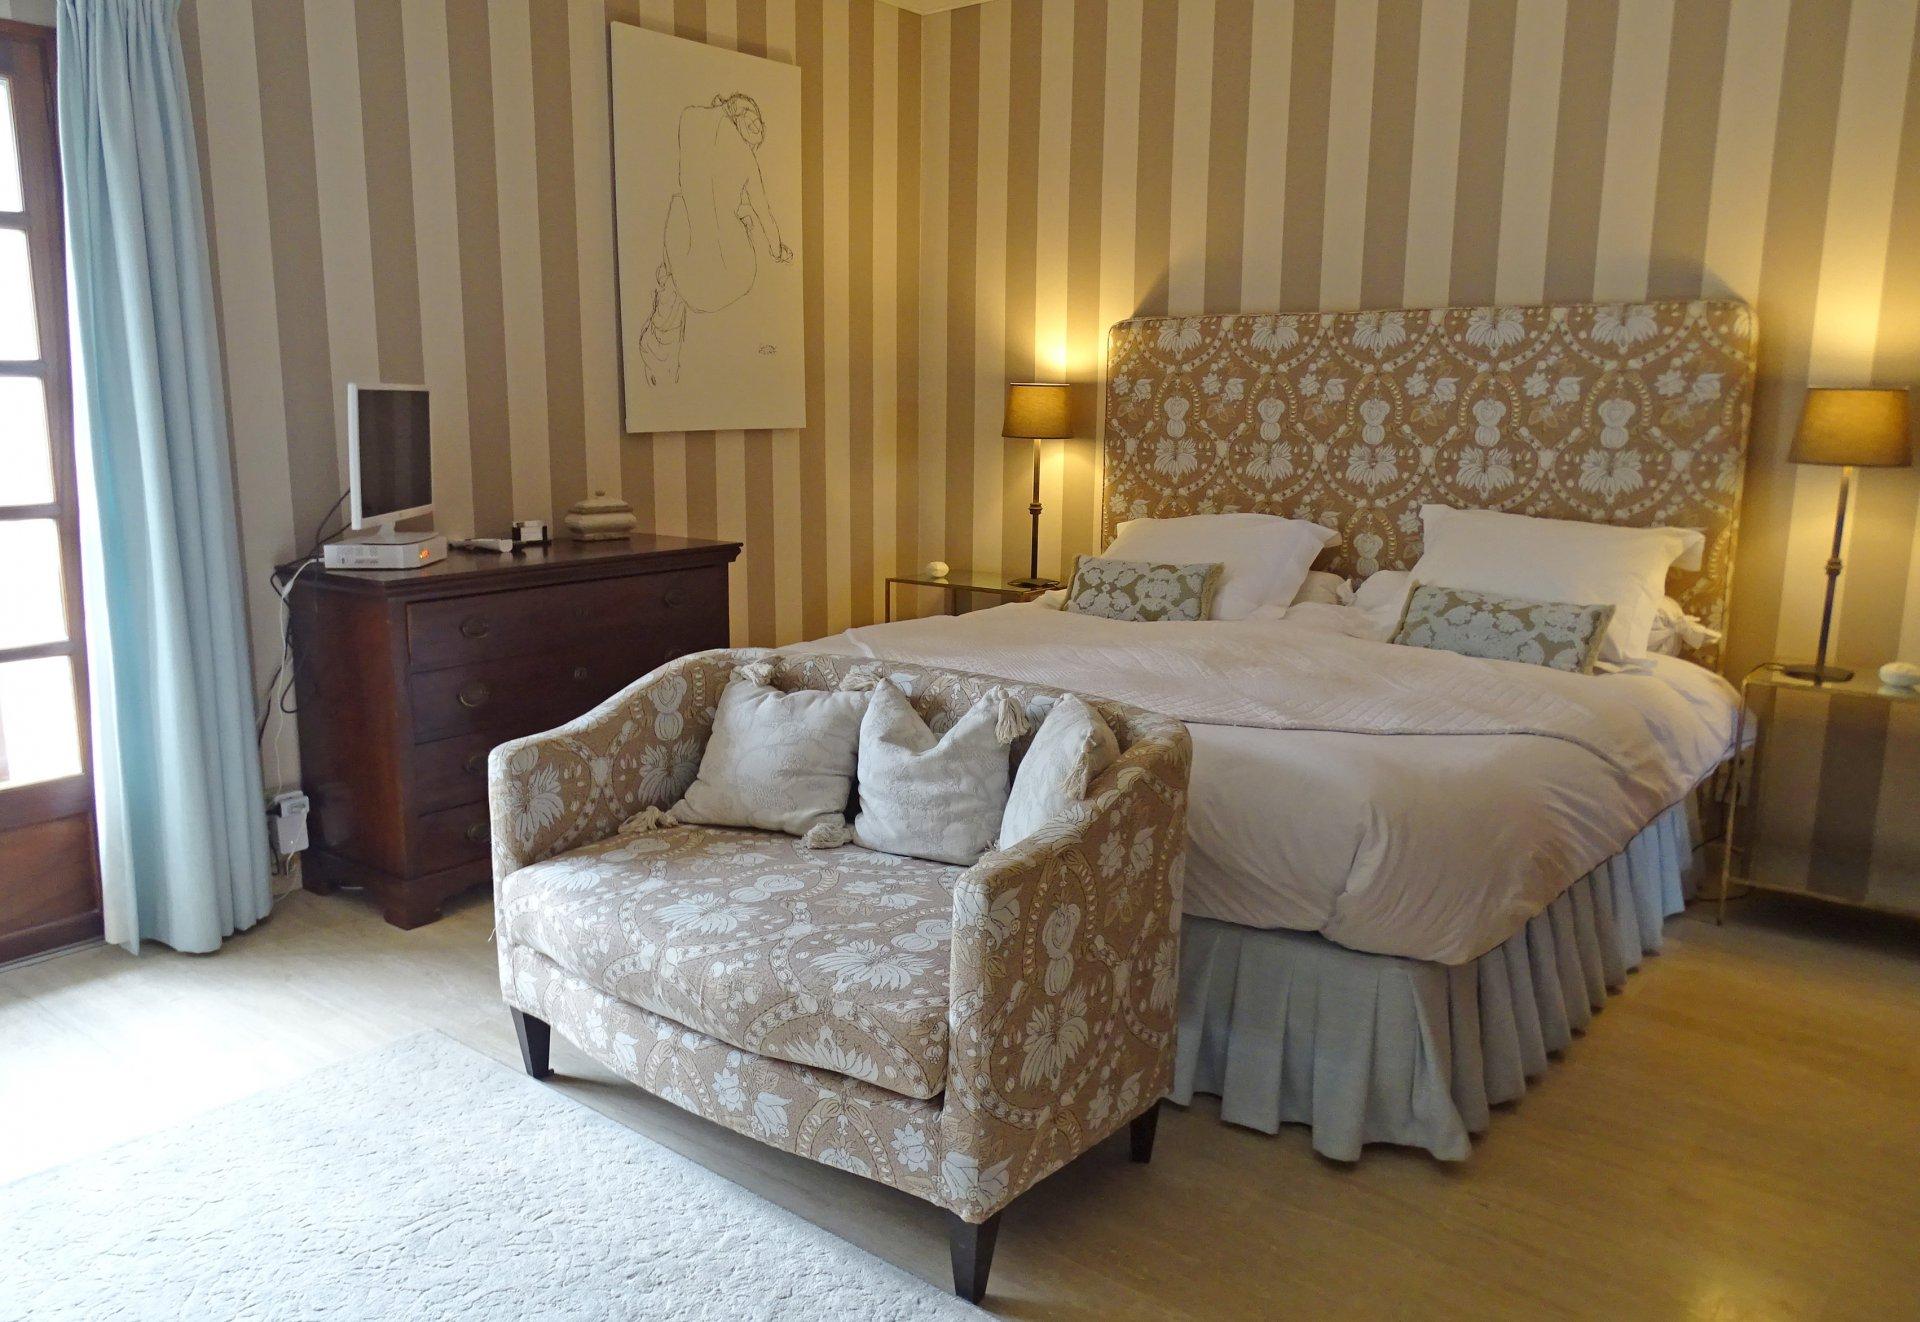 Bedroom, natural light, carpet, wood floors